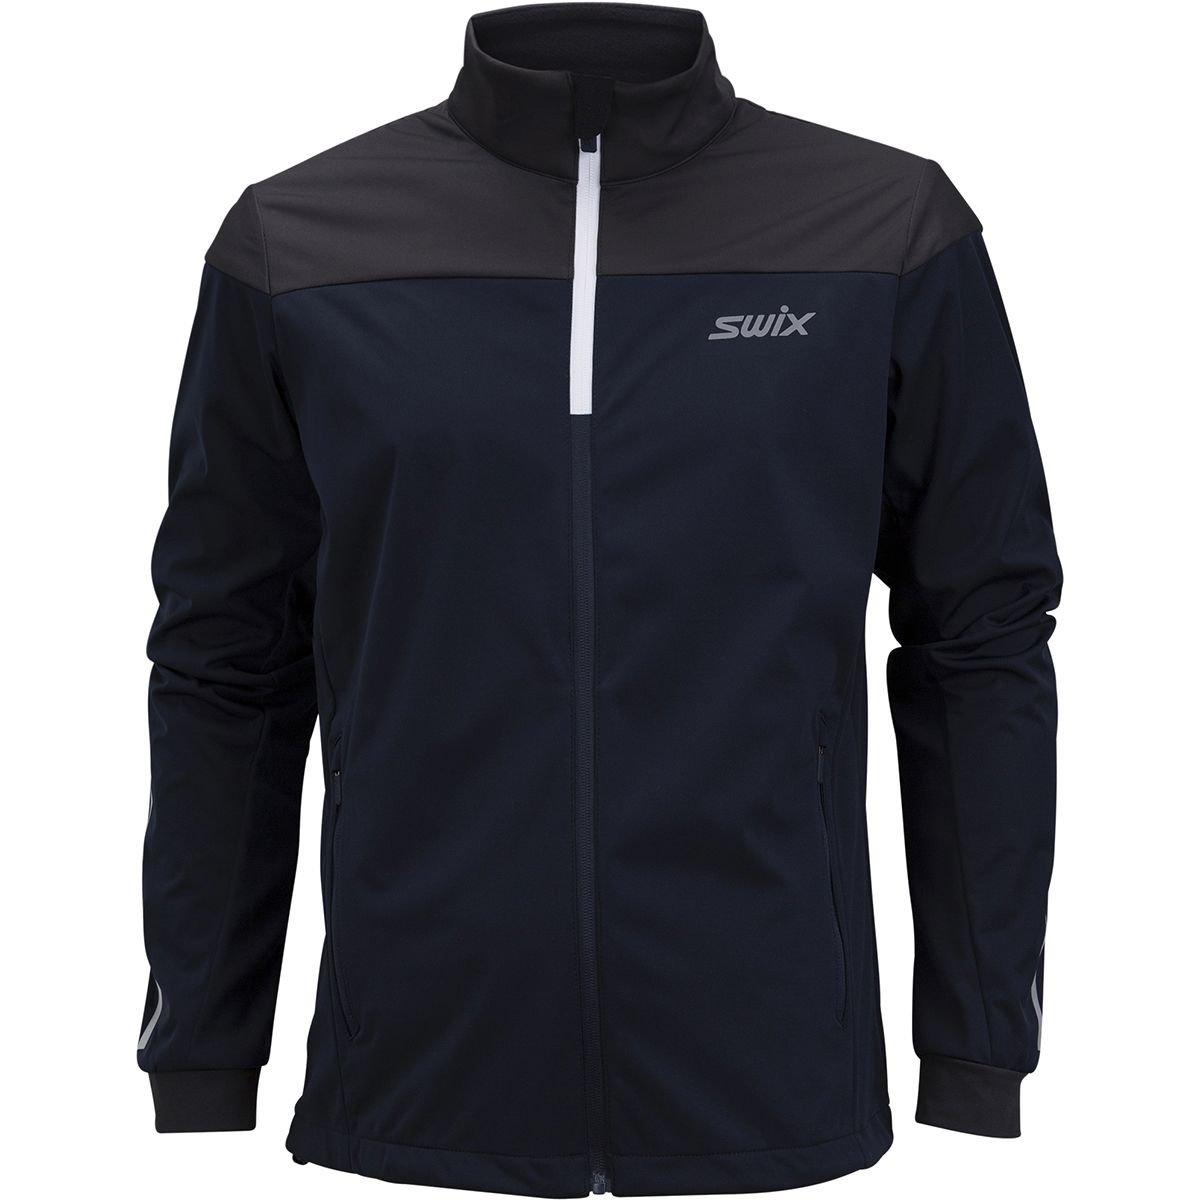 Swix Men's Cross Jacket